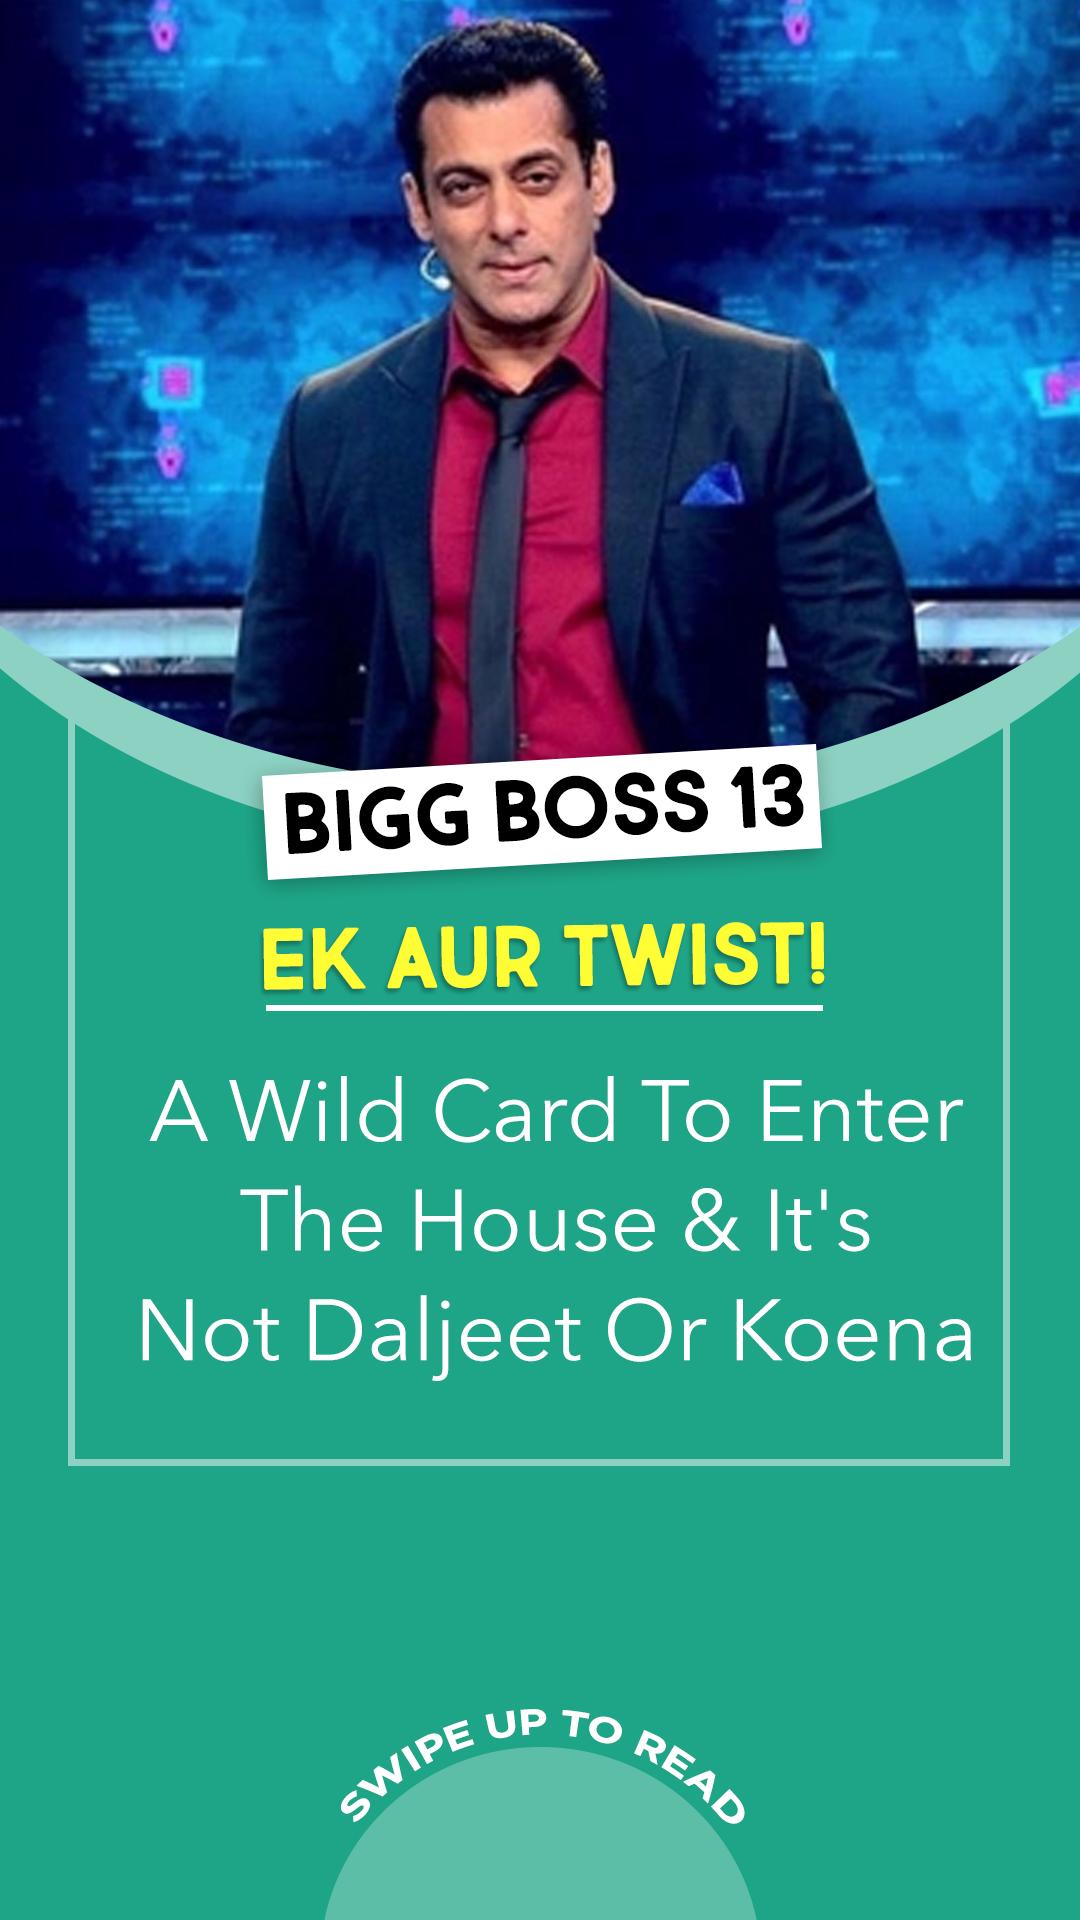 Bigg Boss 13 Ek Aur Twist A Wild Card To Enter The House It S Not Daljeet Or Koena Salmankhan Bollywood Wild Card Twist Cards